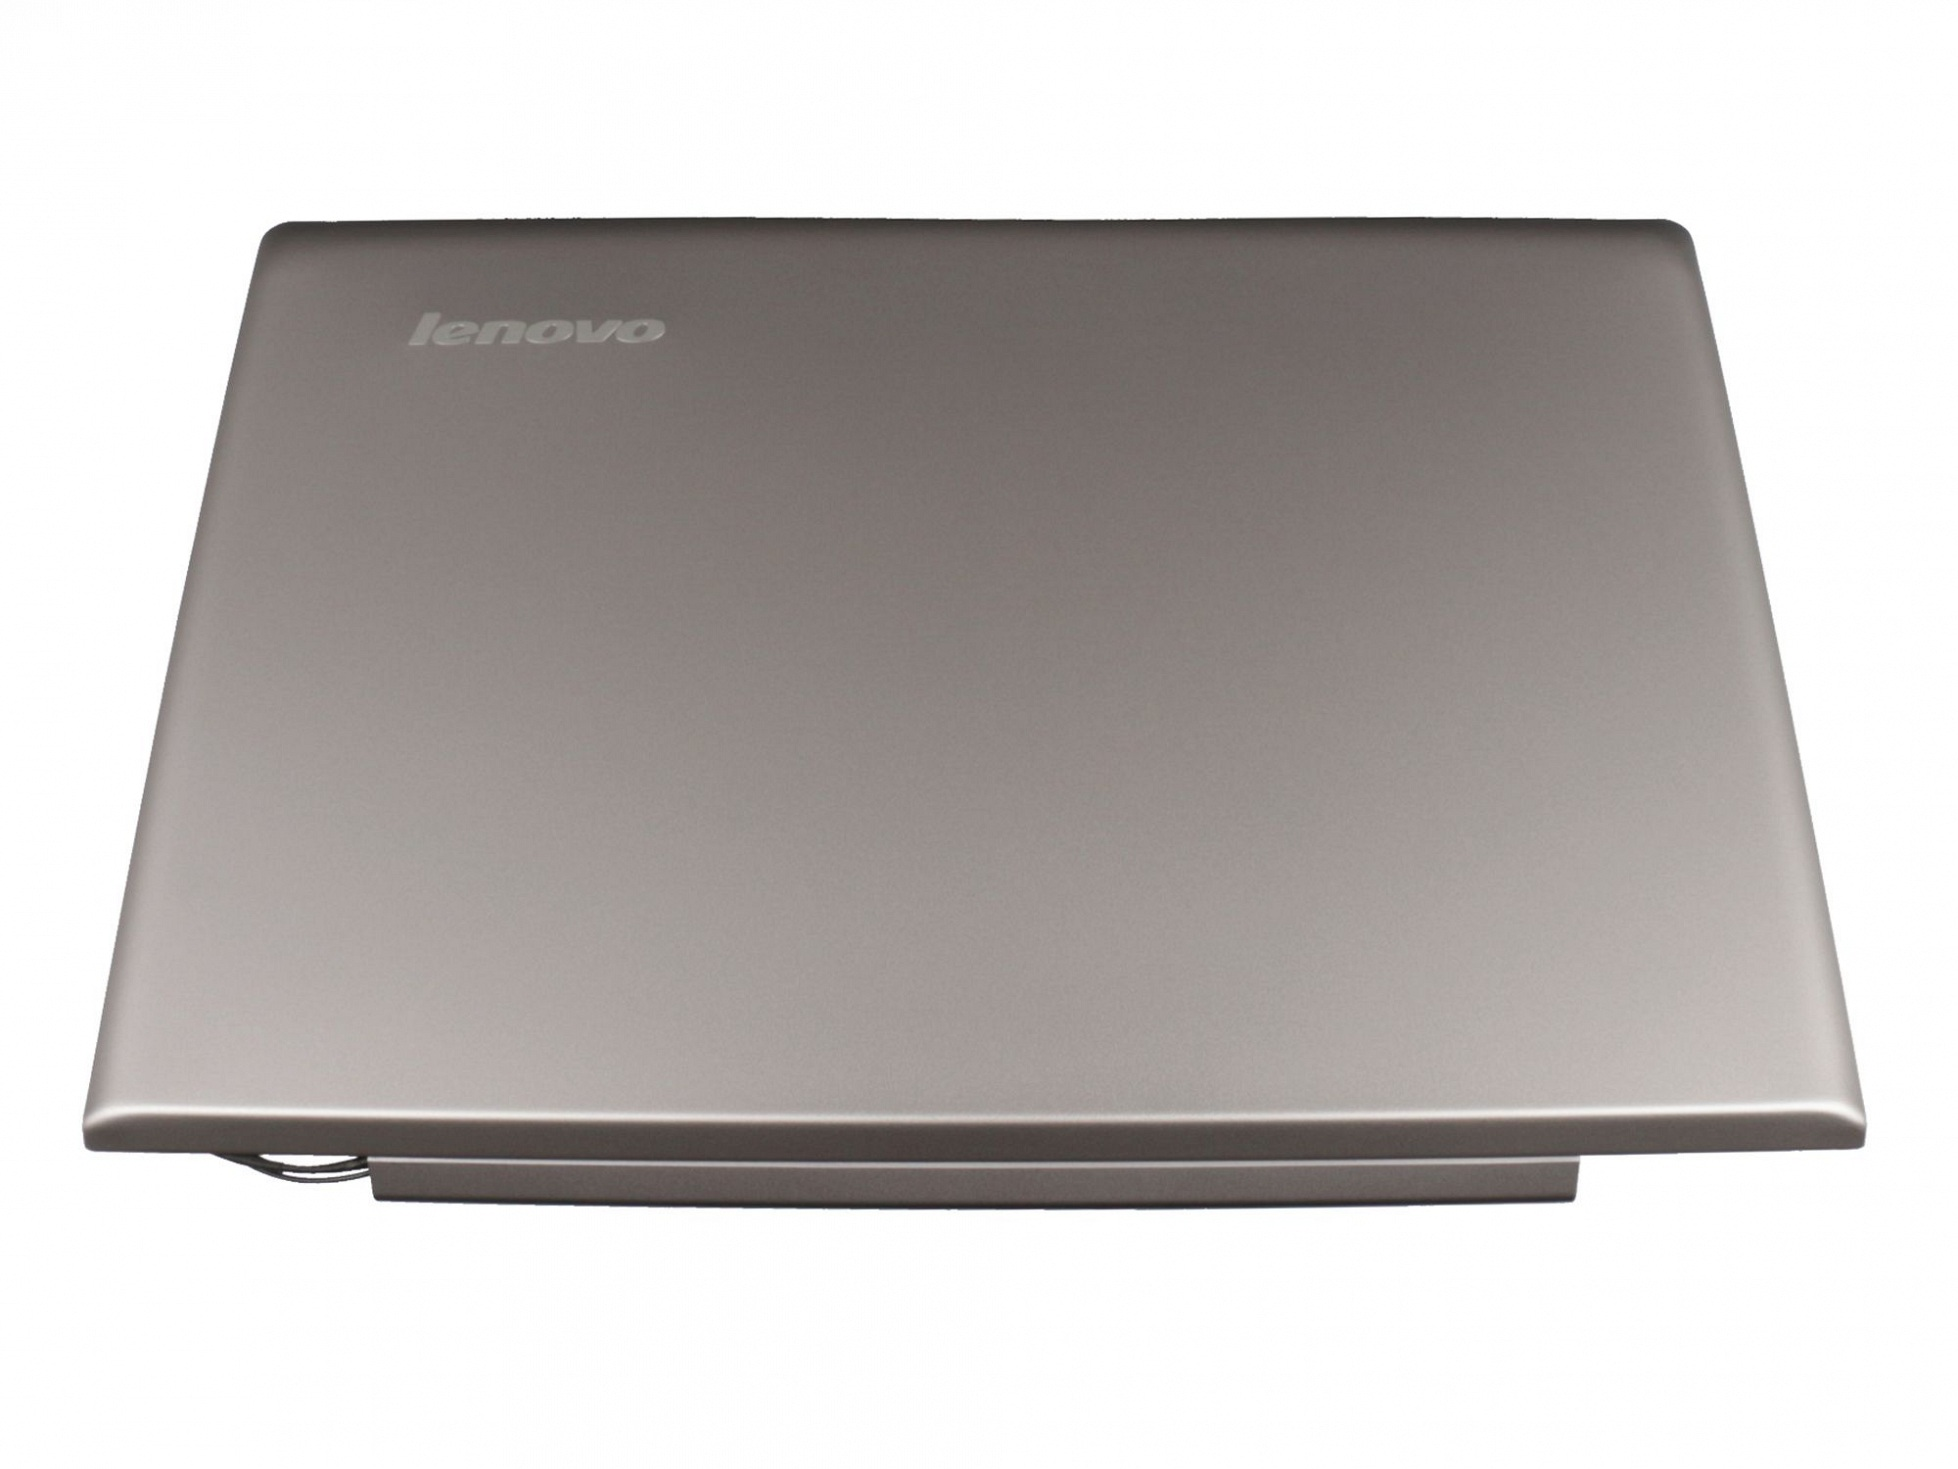 Lenovo 3CLZ5LCLV30 Displaydeckel 33,8cm (13,3 Zoll) grau Original